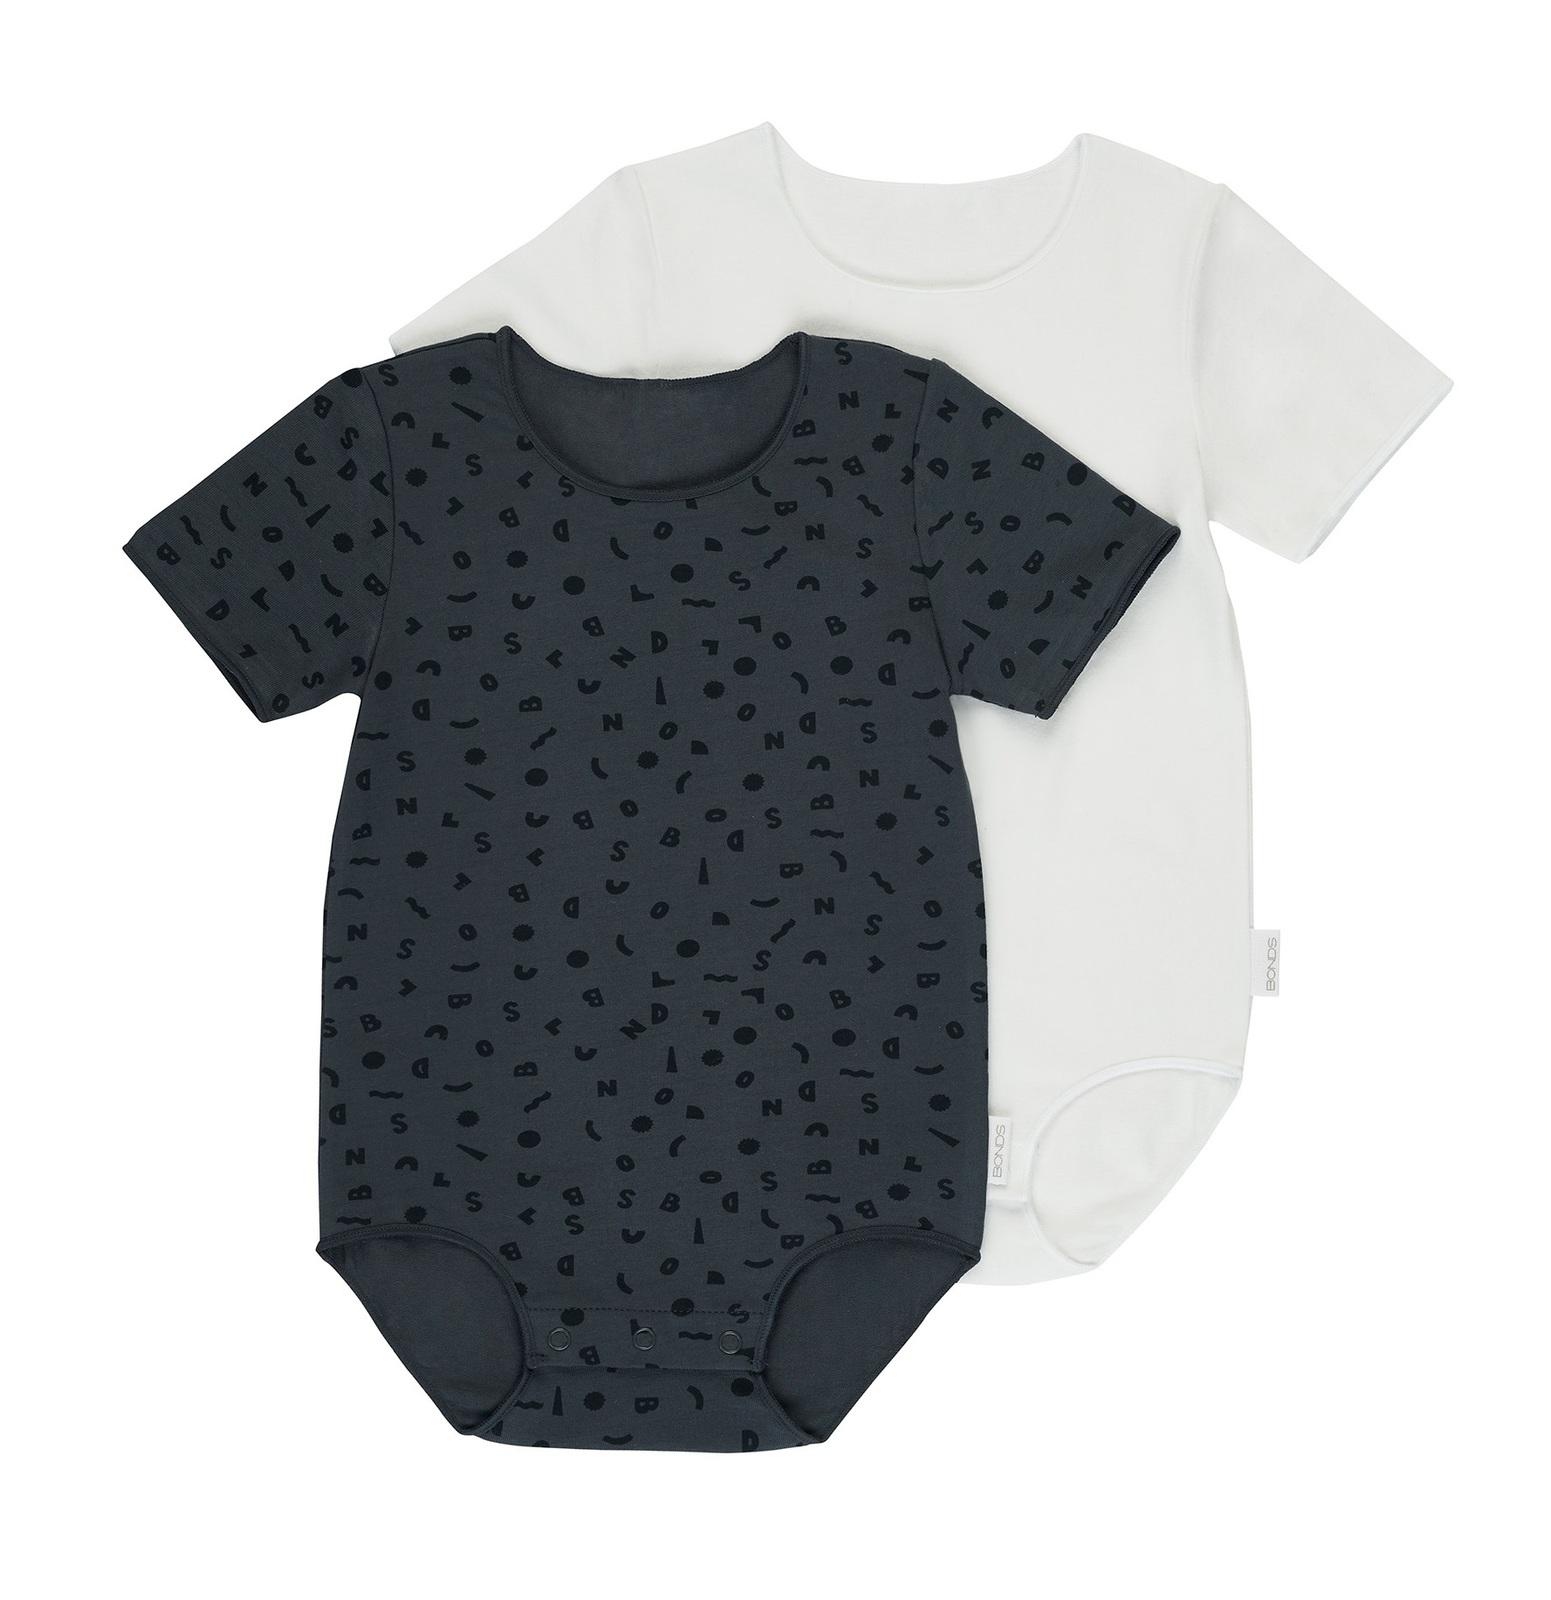 Wonderbodies Bodysuit 2-Pack - Grey/White (Size 00) image